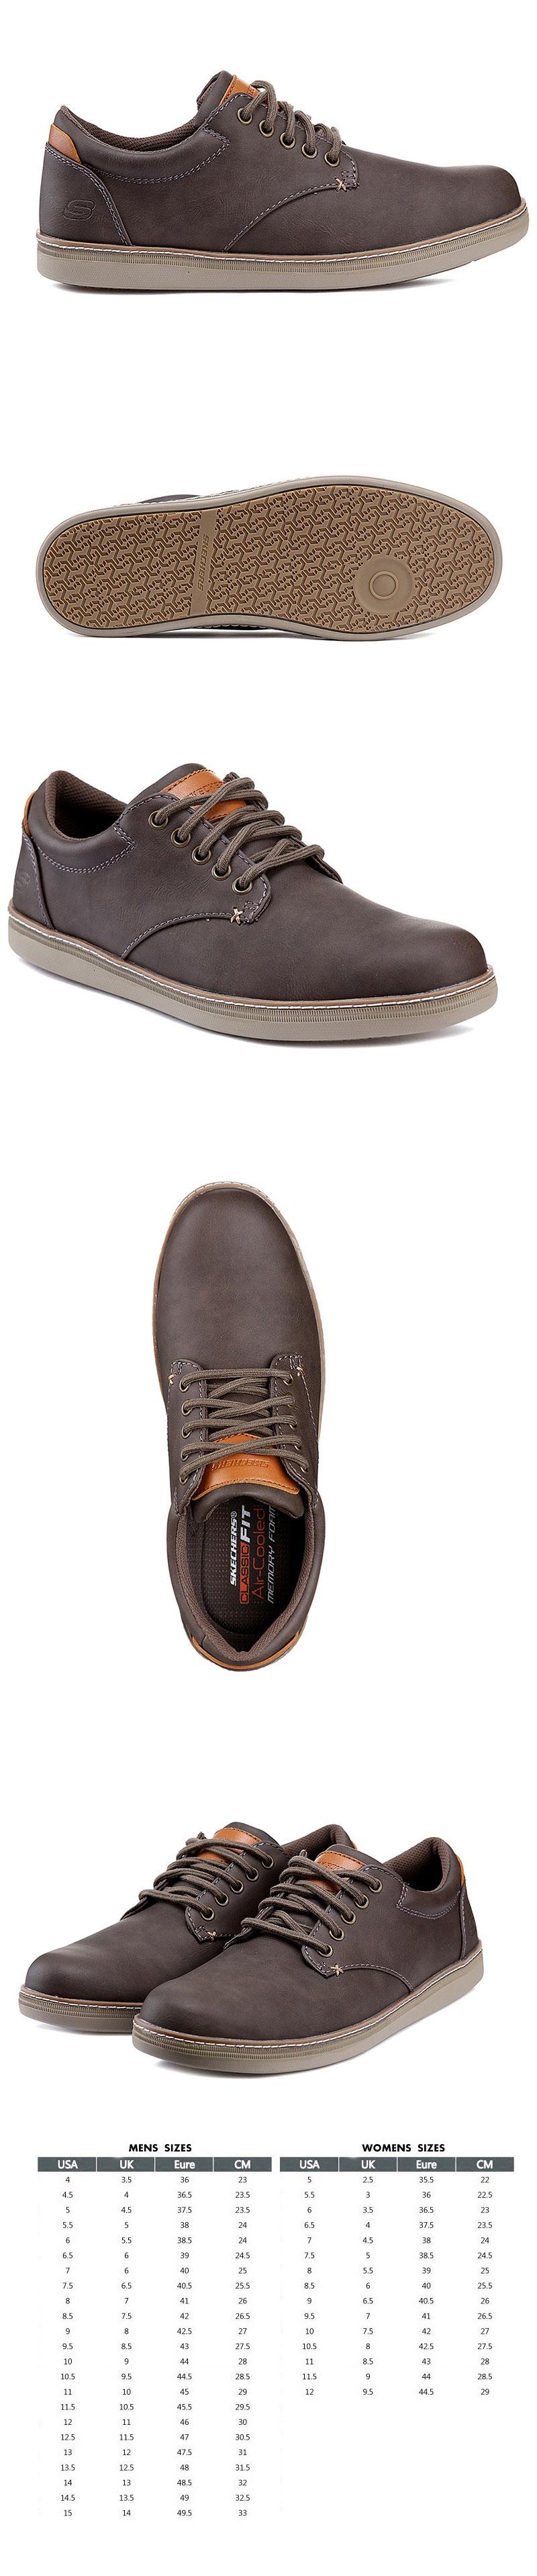 Limpiamente posponer Ortodoxo  Skechers Helmer Steven Men's Casual Shoes SL0MF18X851 | eBay